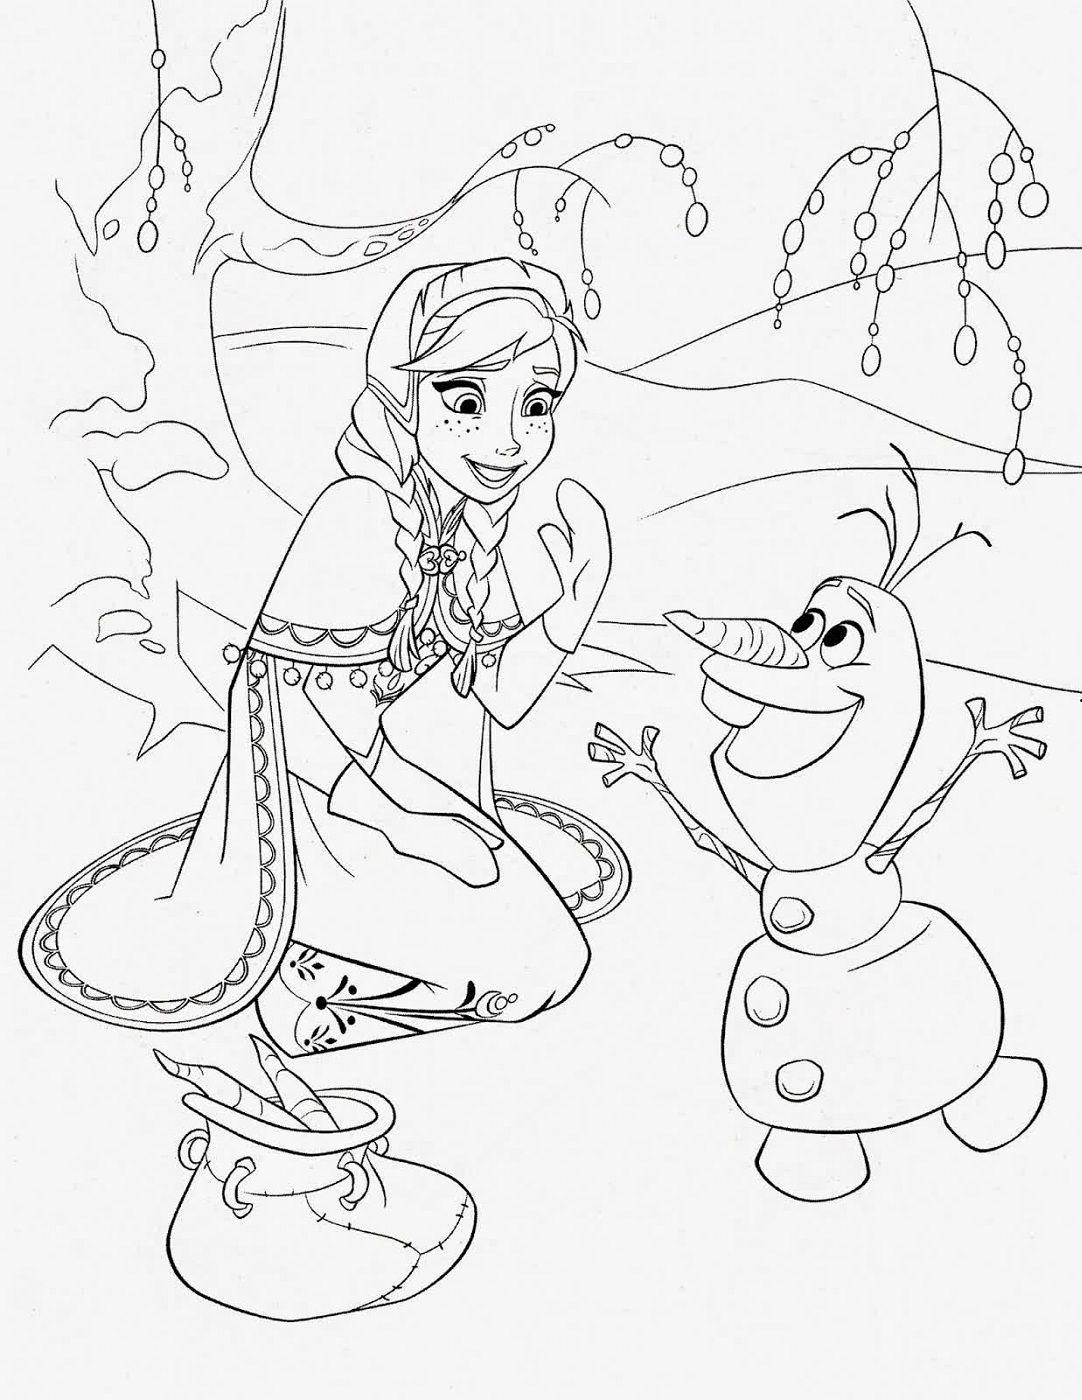 Frozen Worksheets Coloring Printable Elsa Coloring Pages Frozen Coloring Pages Disney Coloring Pages [ 1400 x 1082 Pixel ]